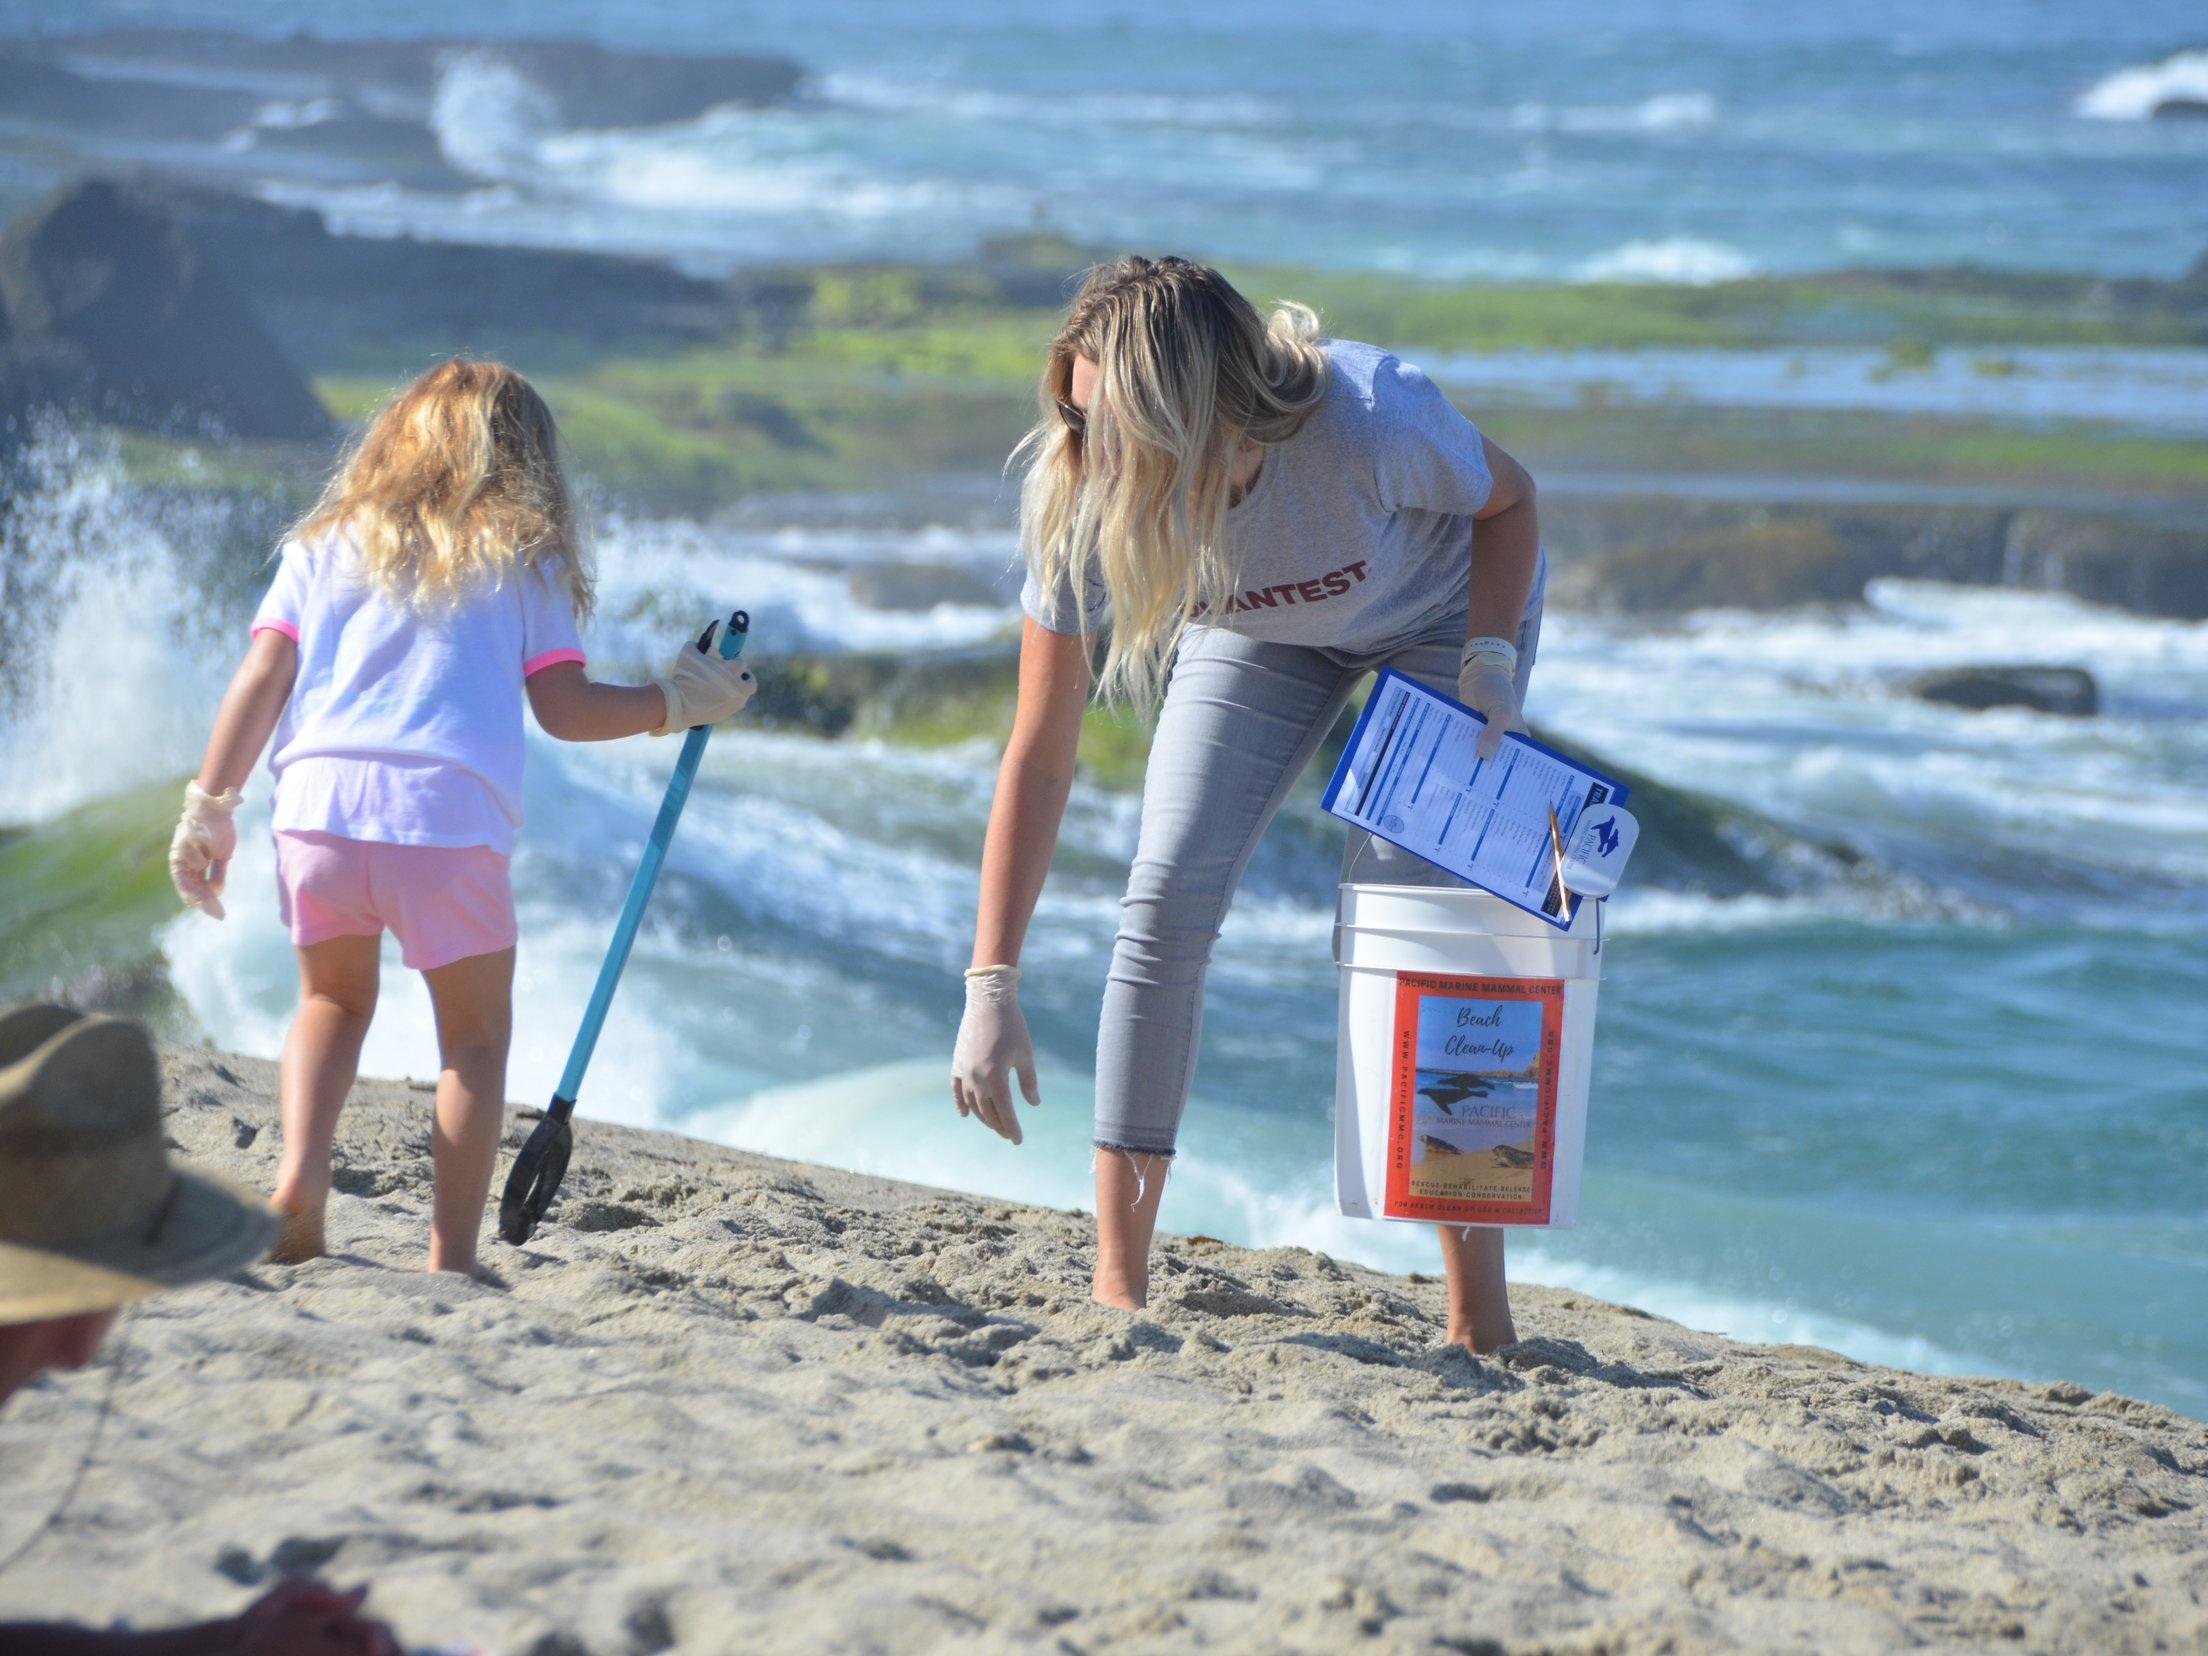 7.24.19 Aliso beach clean up (11).JPG